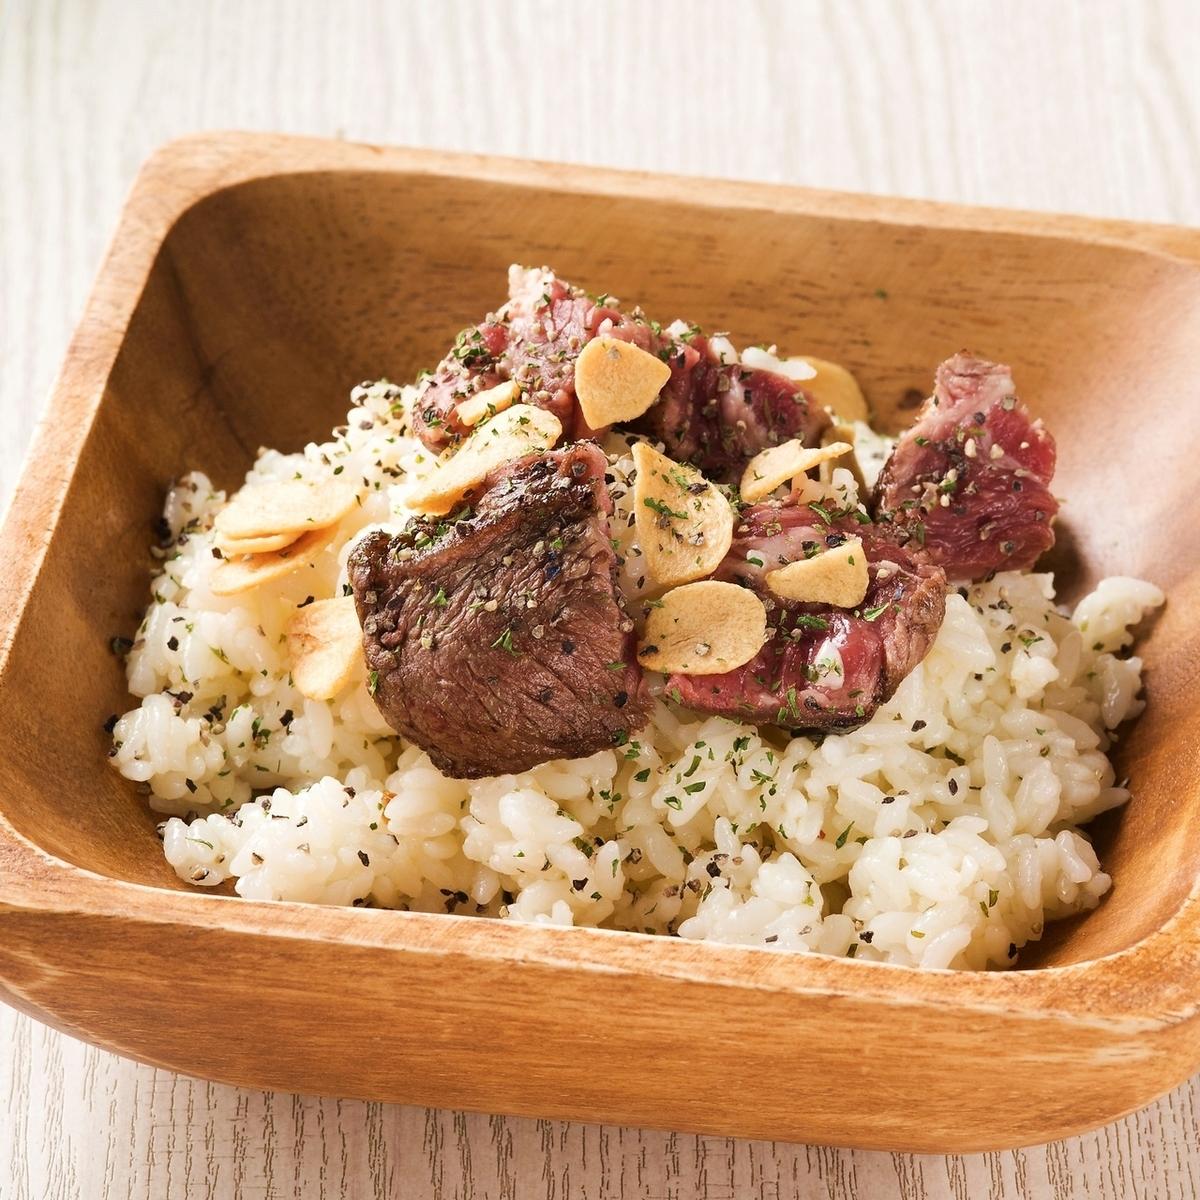 NIKU garlic rice